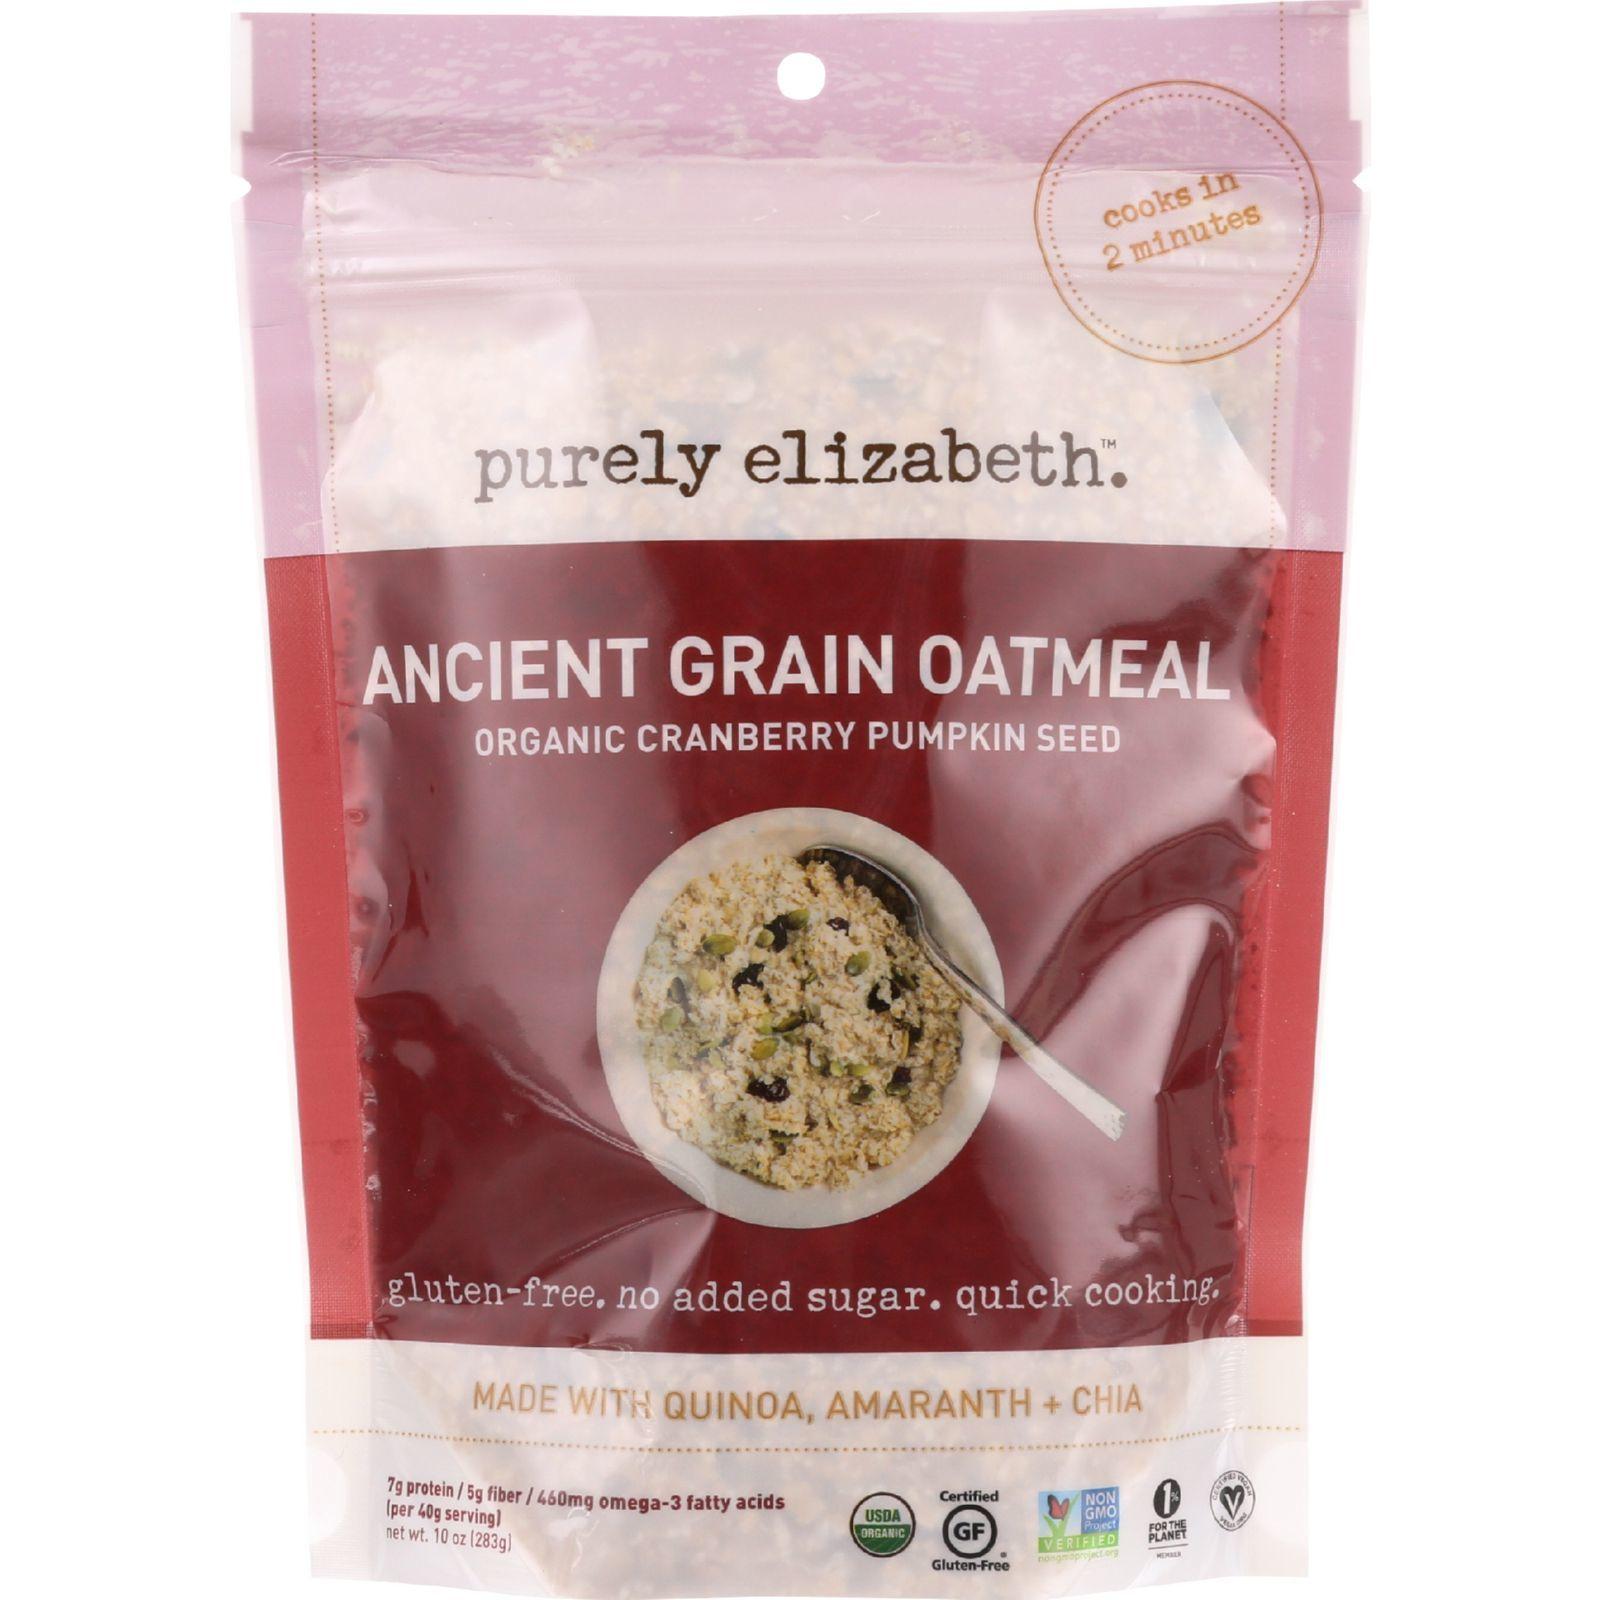 Purely Elizabeth Oatmeal - Organic - Ancient Grain - Cranberry Pumpkin Seed - 10 oz - case of 6